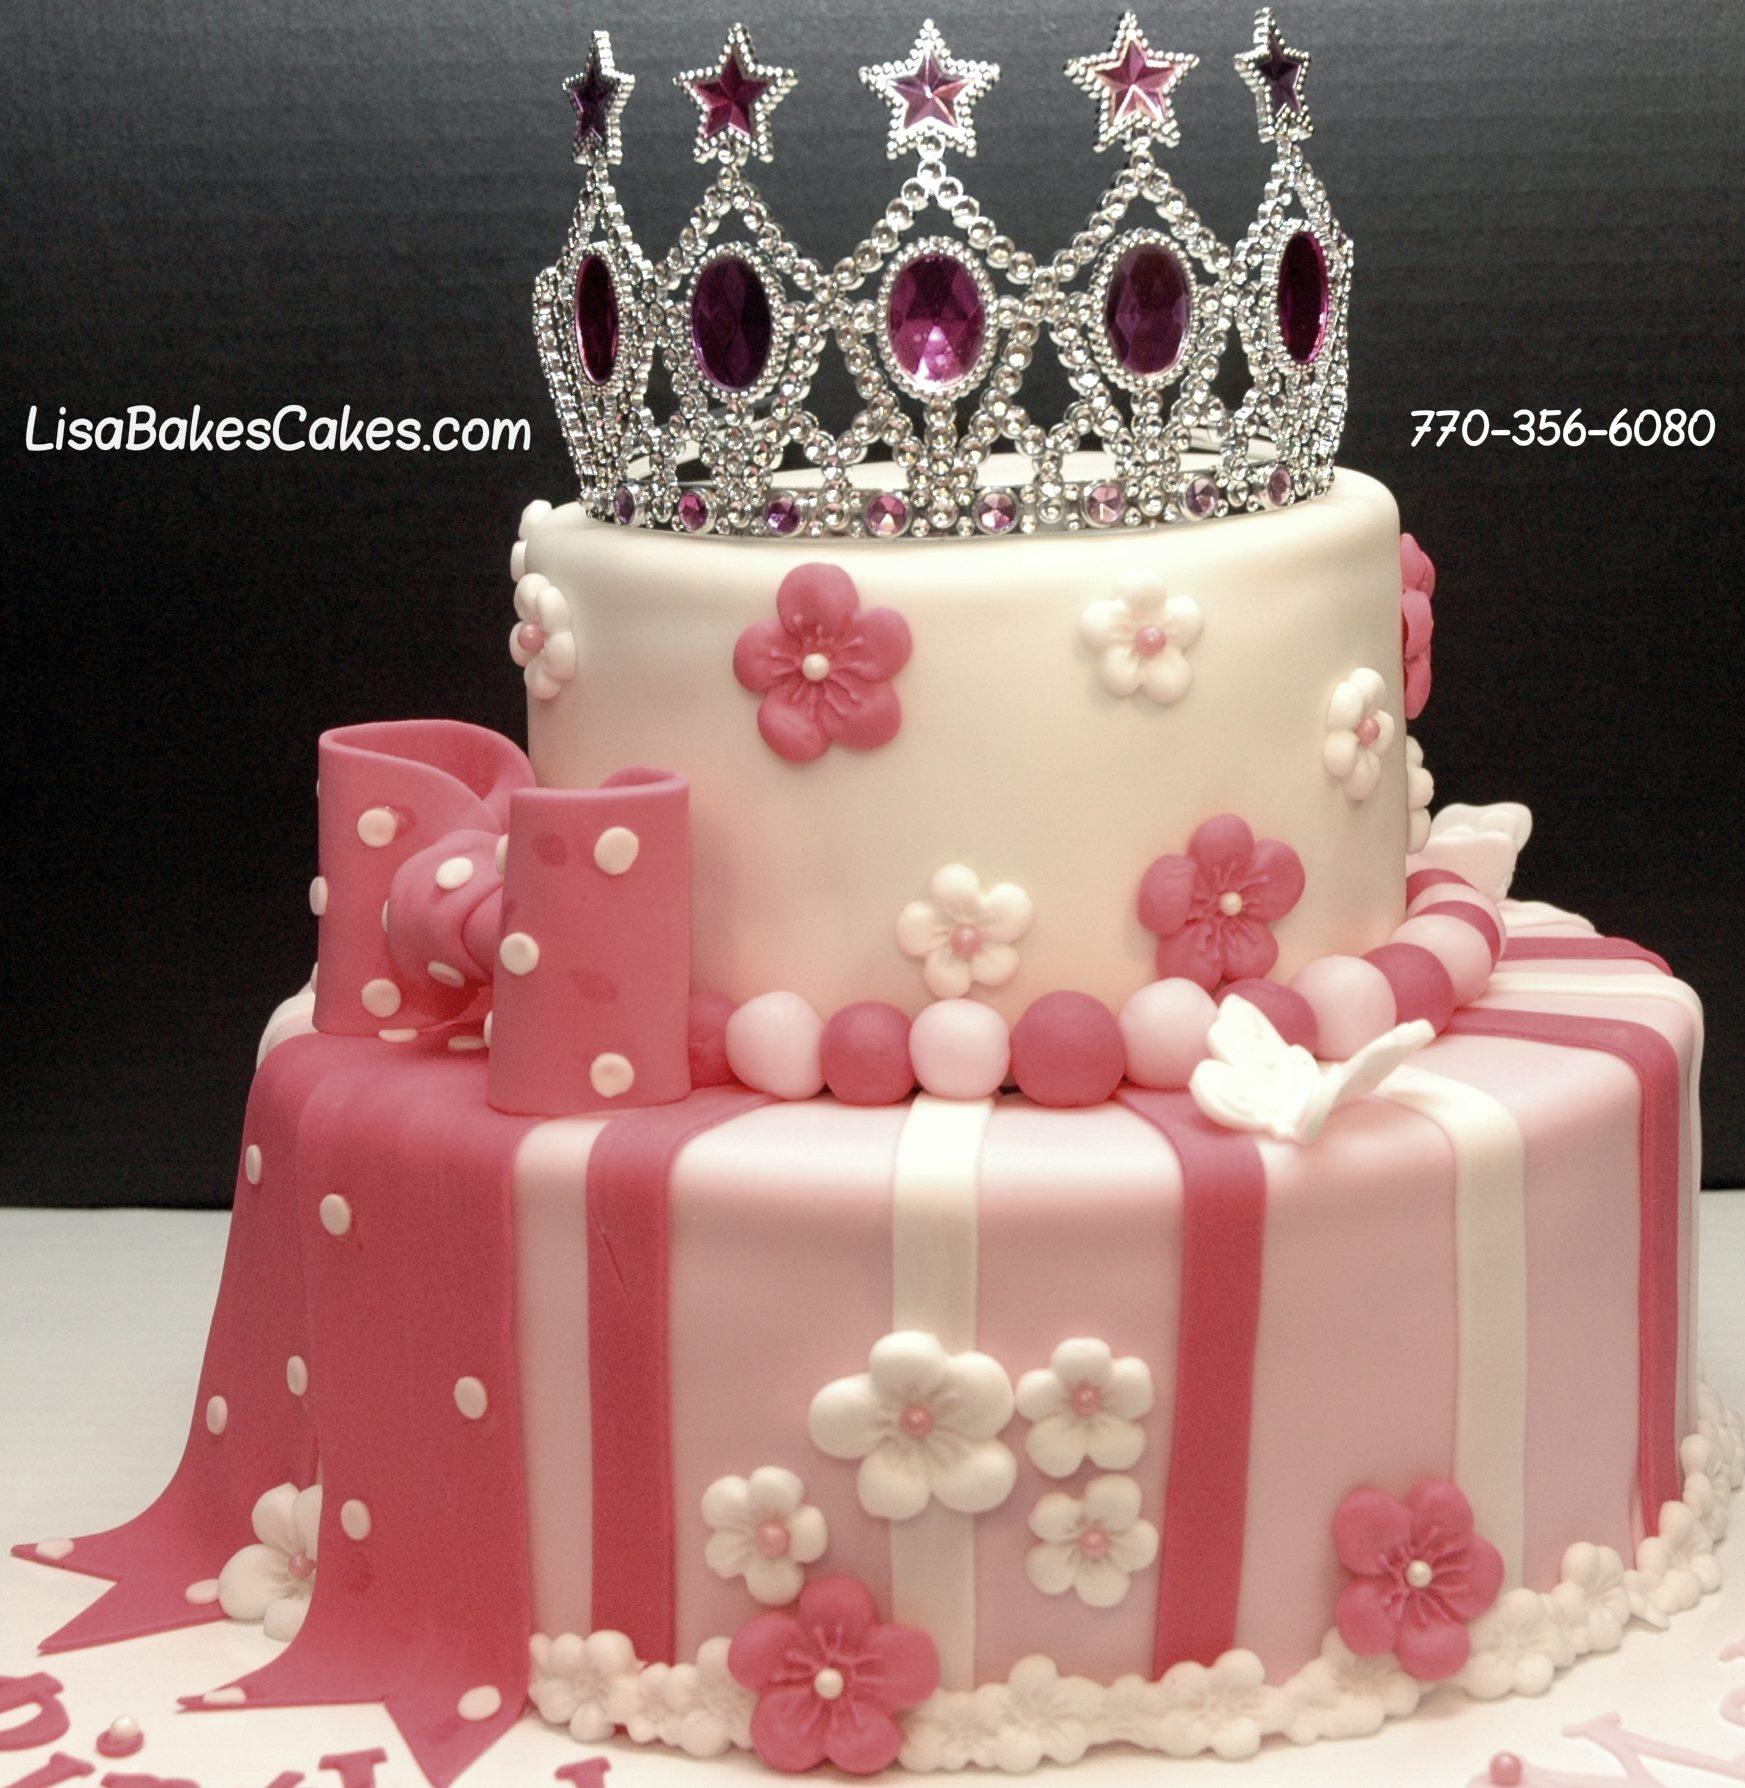 Lisa Bakes Cakes 5888 Rockmart Rd SE, Silver Creek, GA 30173 - YP.com